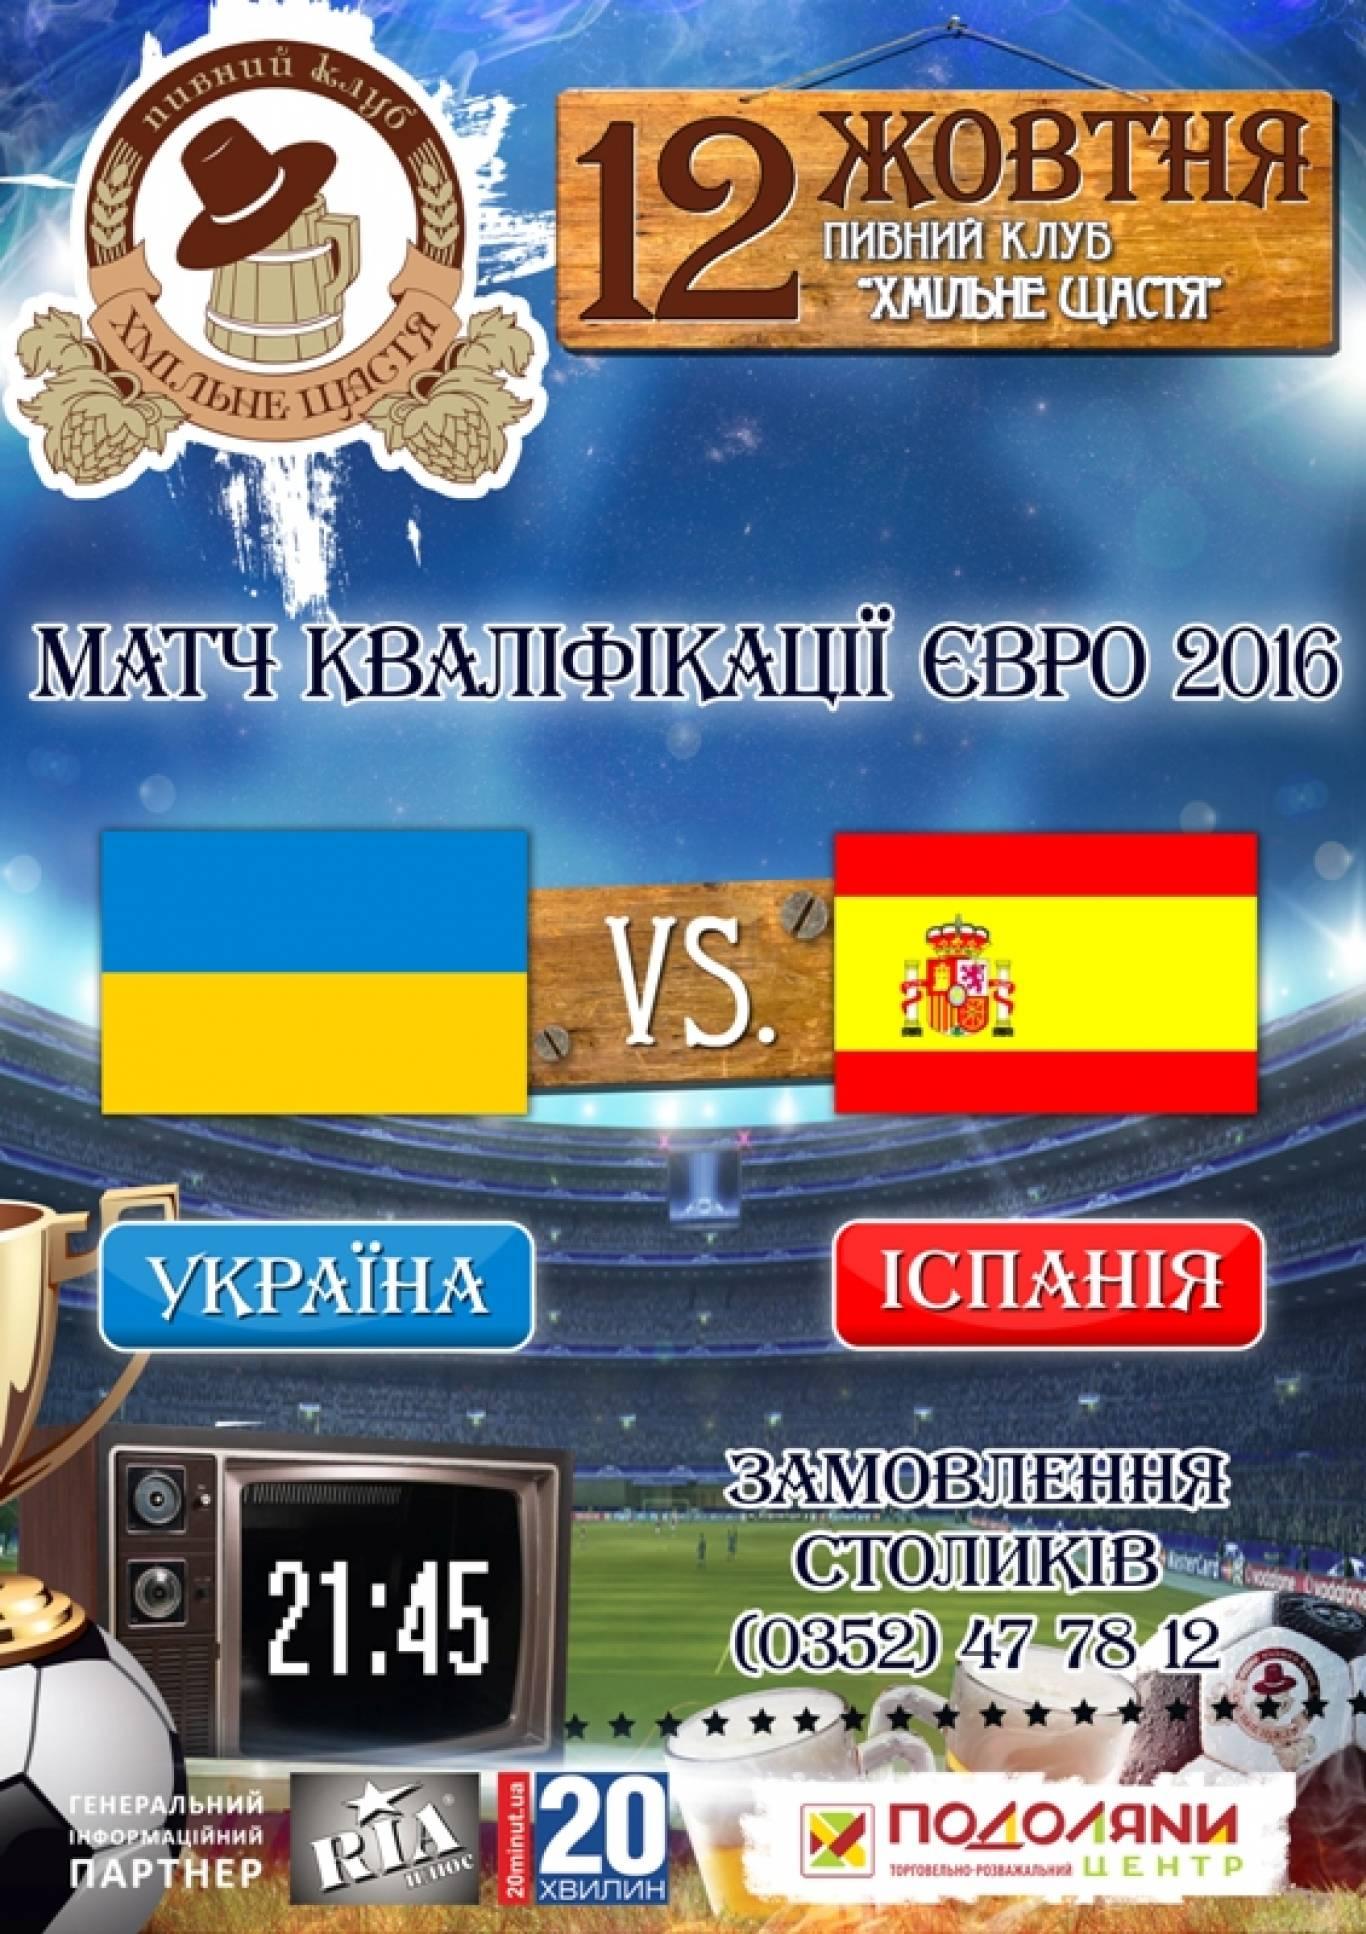 Футбол: Україна - Іспанія